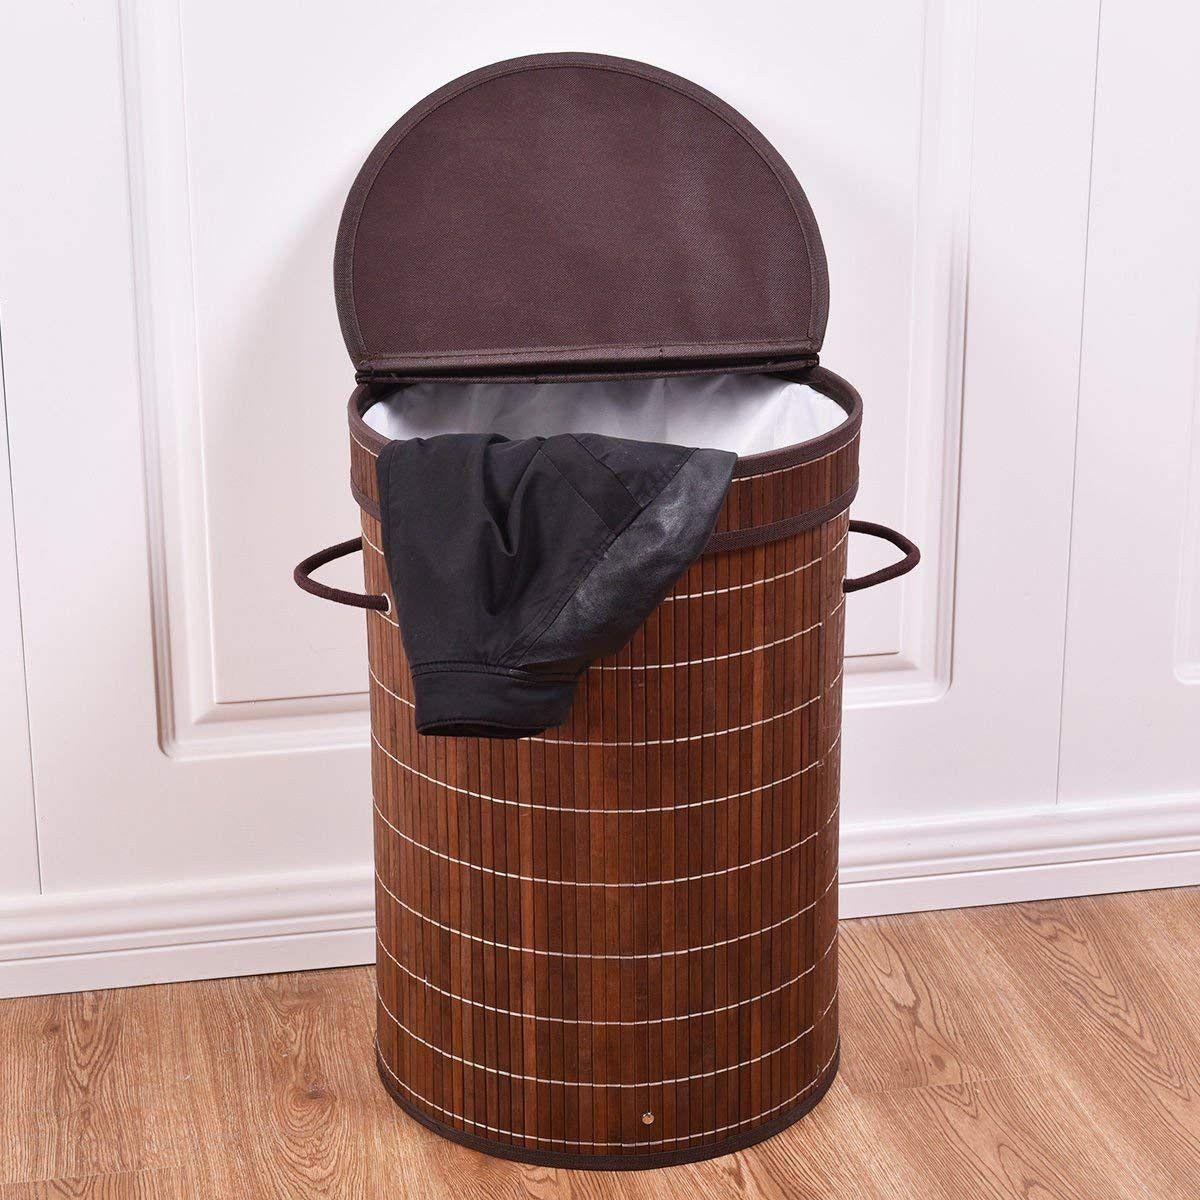 New Bamboo Hamper Laundry Basket Washing Cloth Storage Bin Bag W//Folding Lid